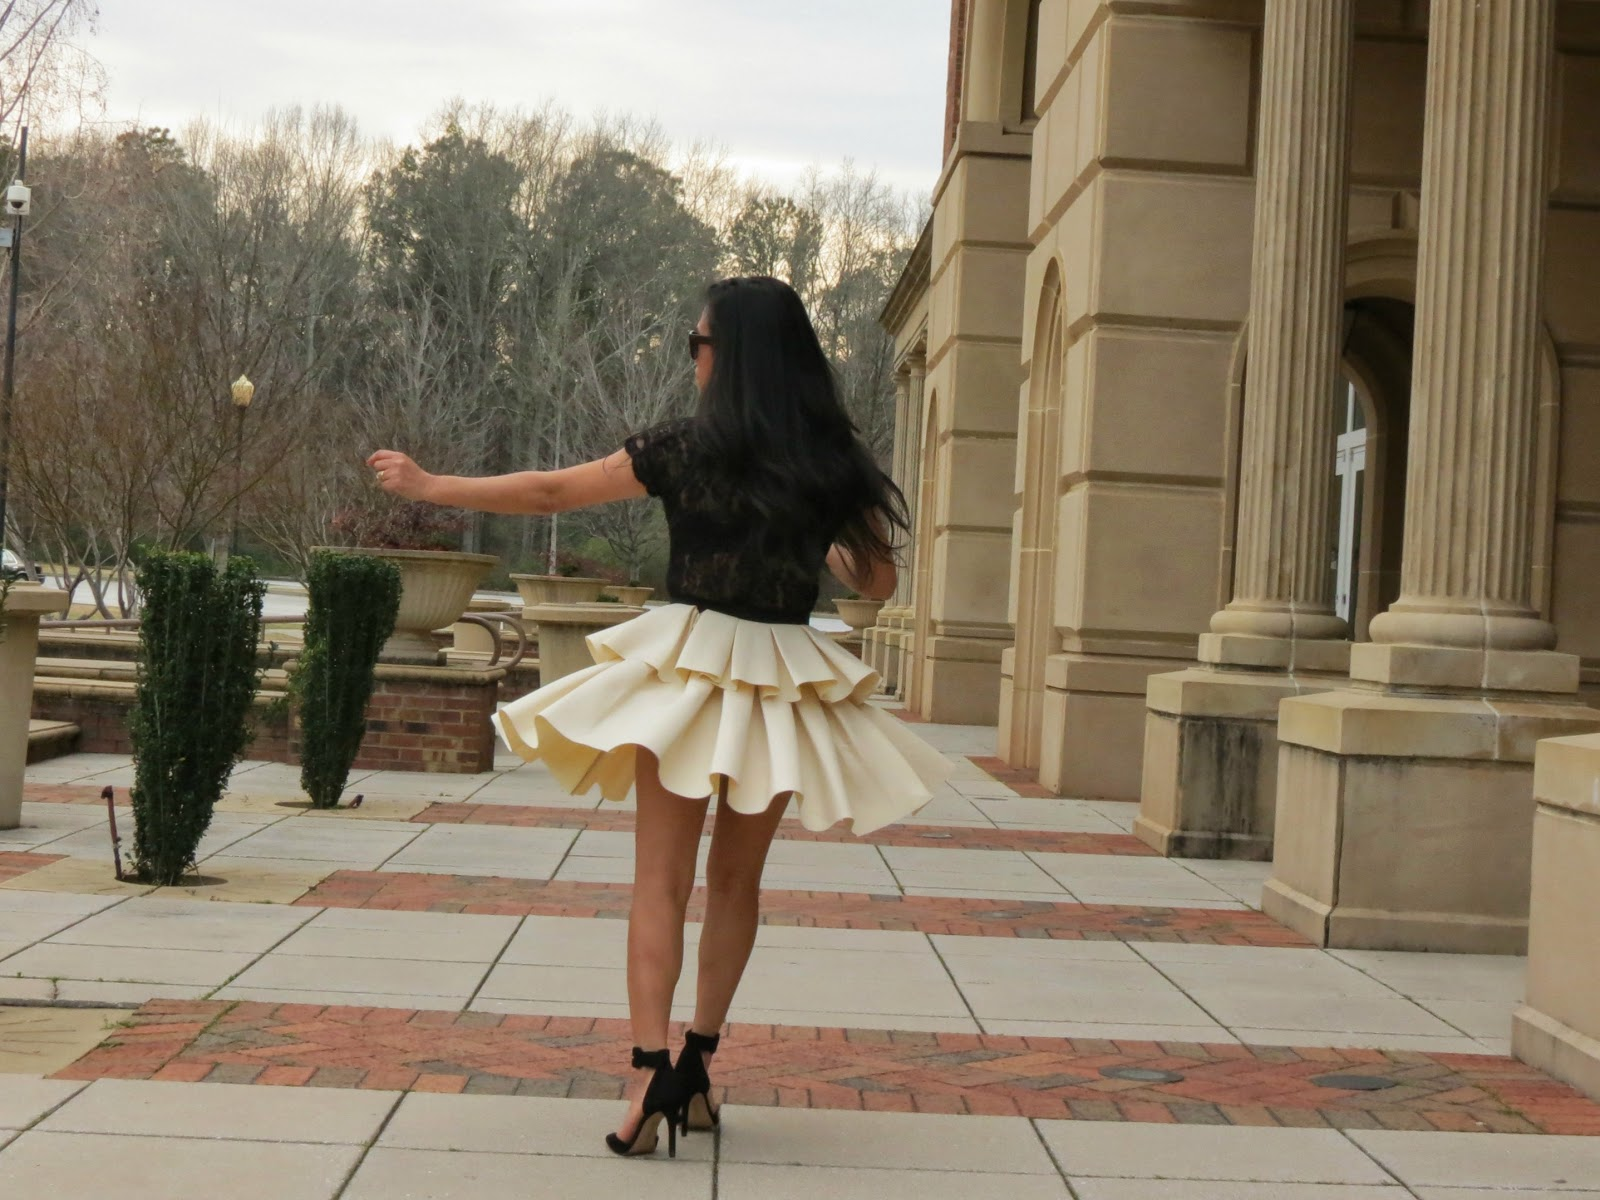 2d475d7d69 Peplum Top With Lace Lace Peplum Skirt: Fabulous Petite: Monday Twirl :  Peplum Skirt + Lace